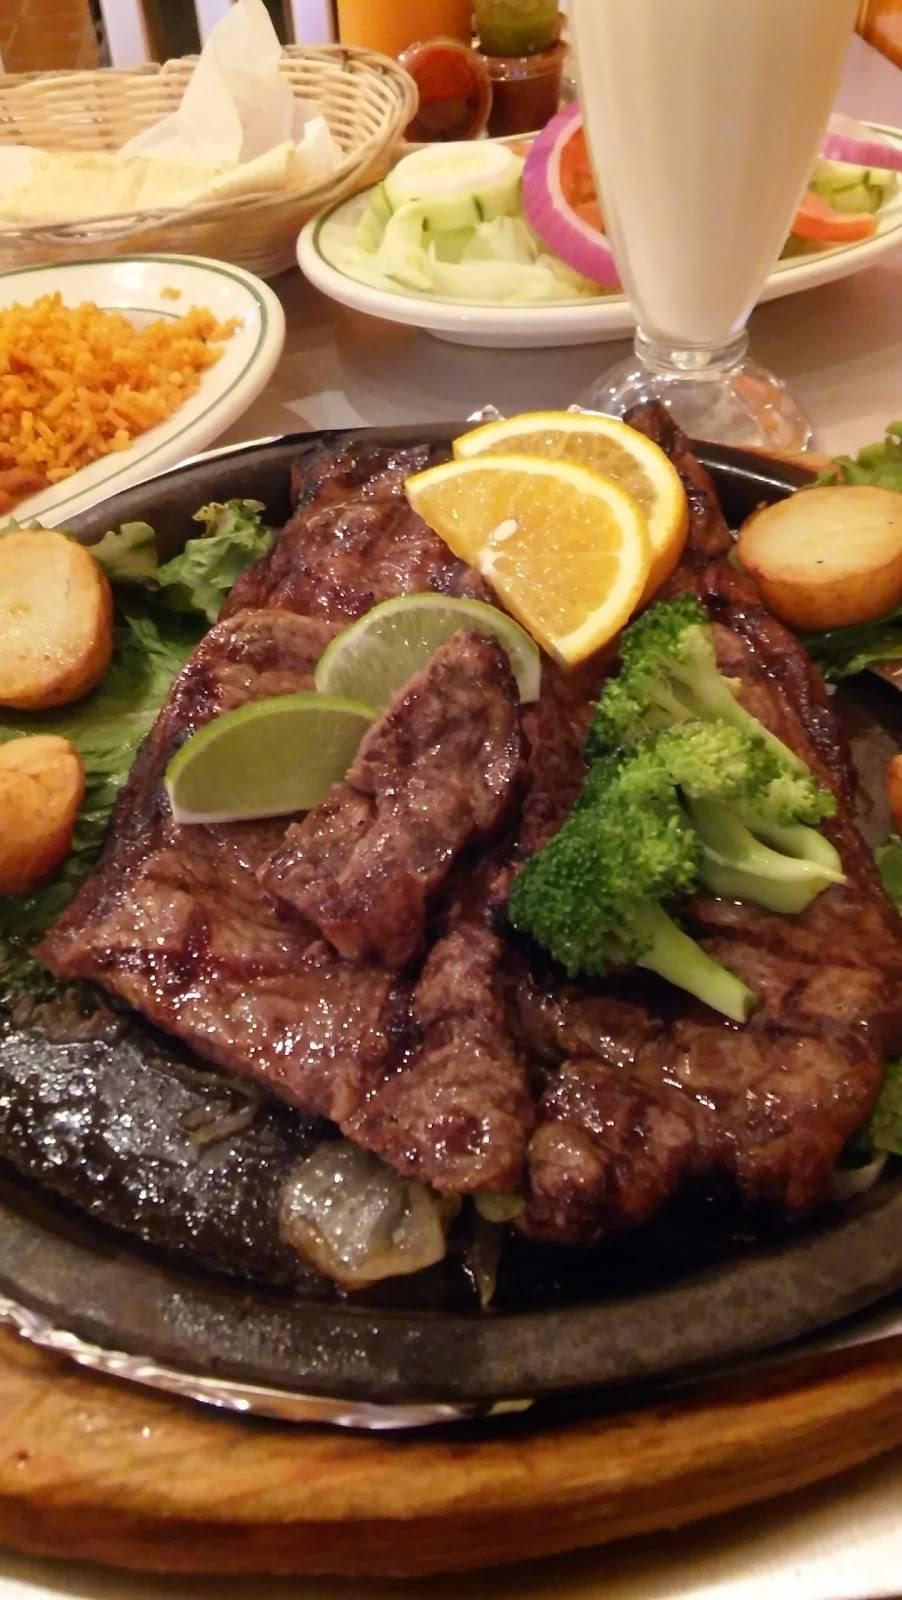 Pico De Gallo | restaurant | 82-12 Roosevelt Ave, Jackson Heights, NY 11372, USA | 7186393999 OR +1 718-639-3999